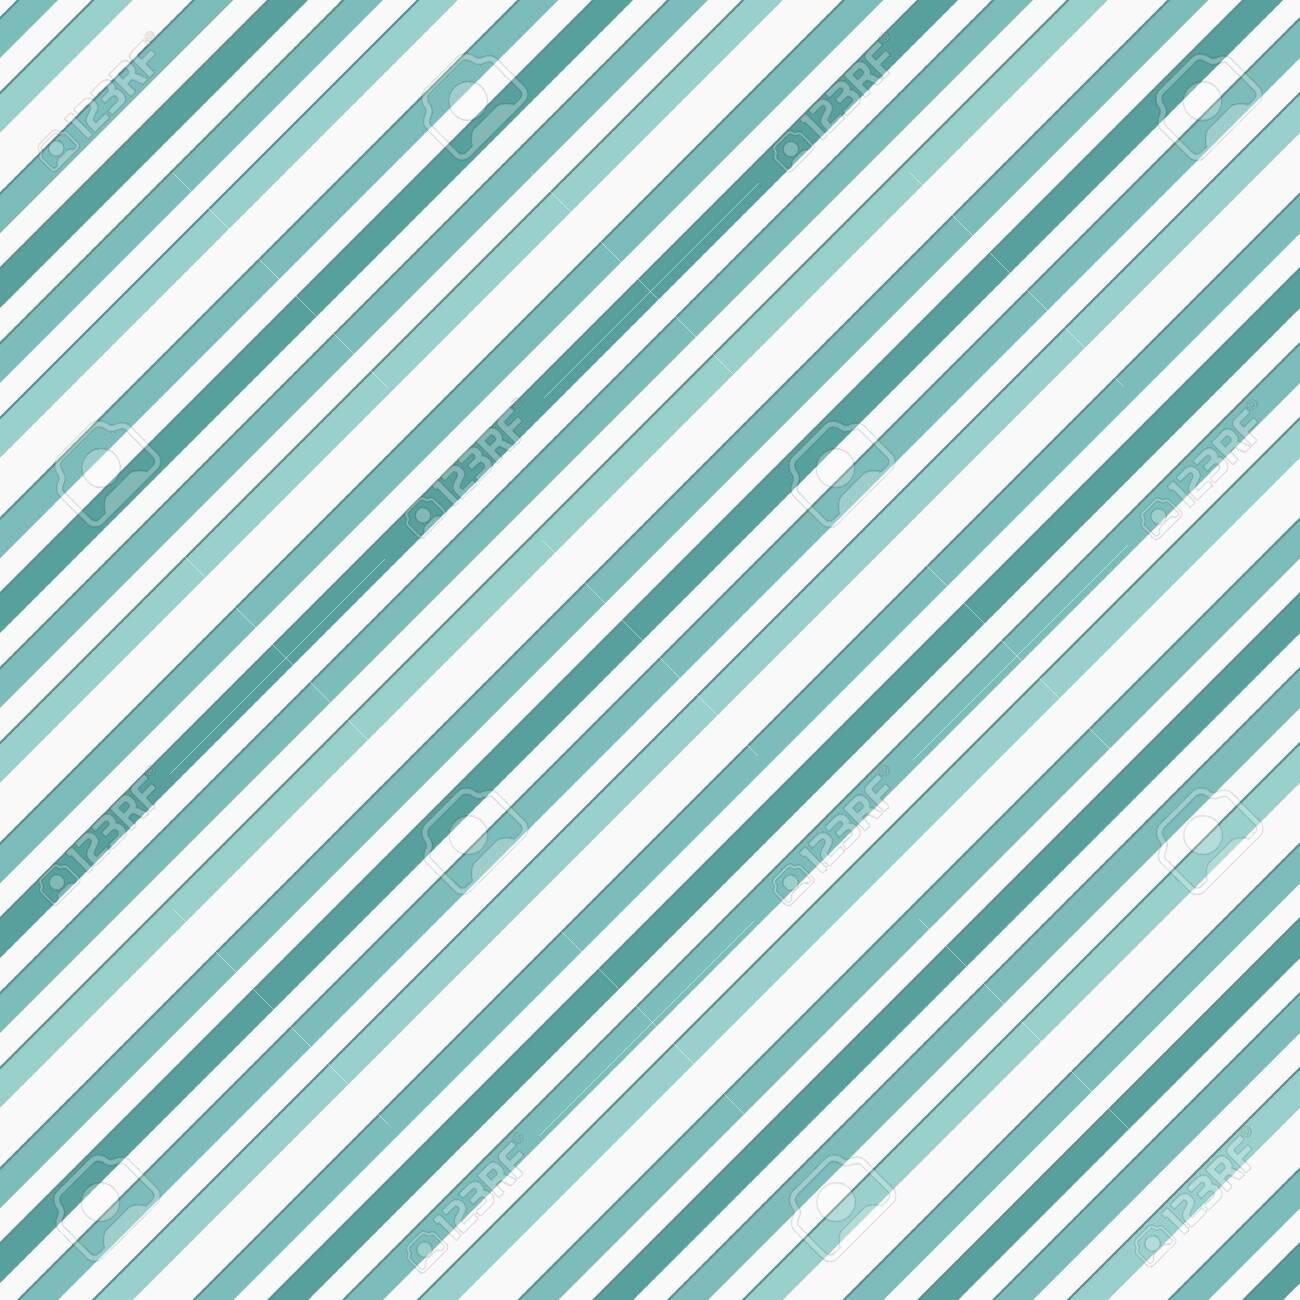 Diagonal stripes pattern  Geometric background, simple illustration